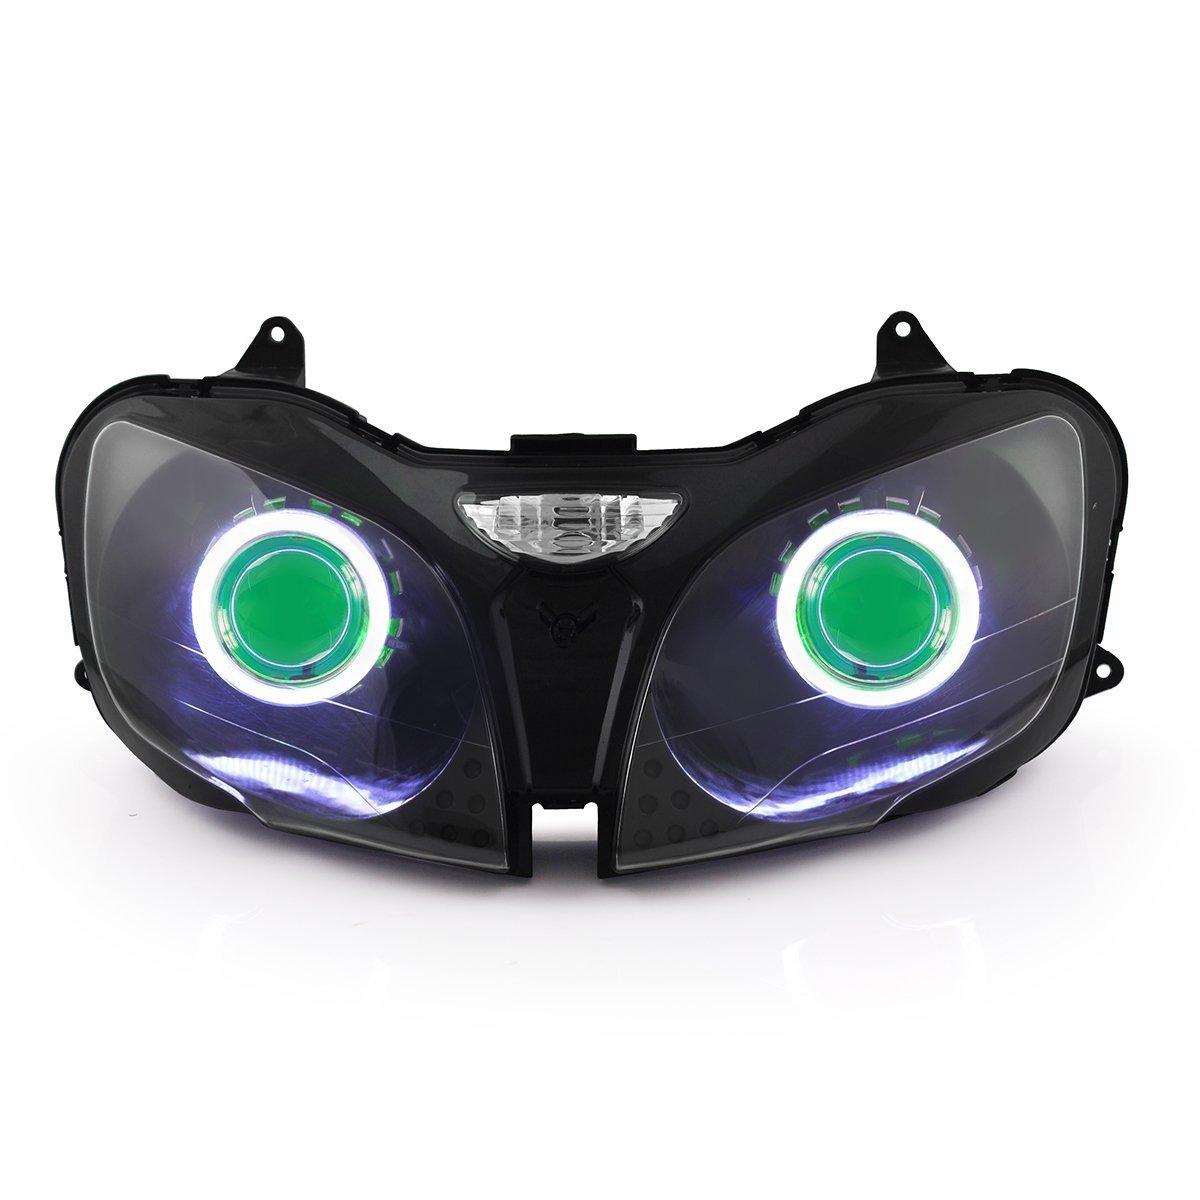 KT LED Angel Eye Headlight Assembly for Kawasaki Ninja ZX6 ZX6R ZX-6R 2000-2002 Green Demon Eye